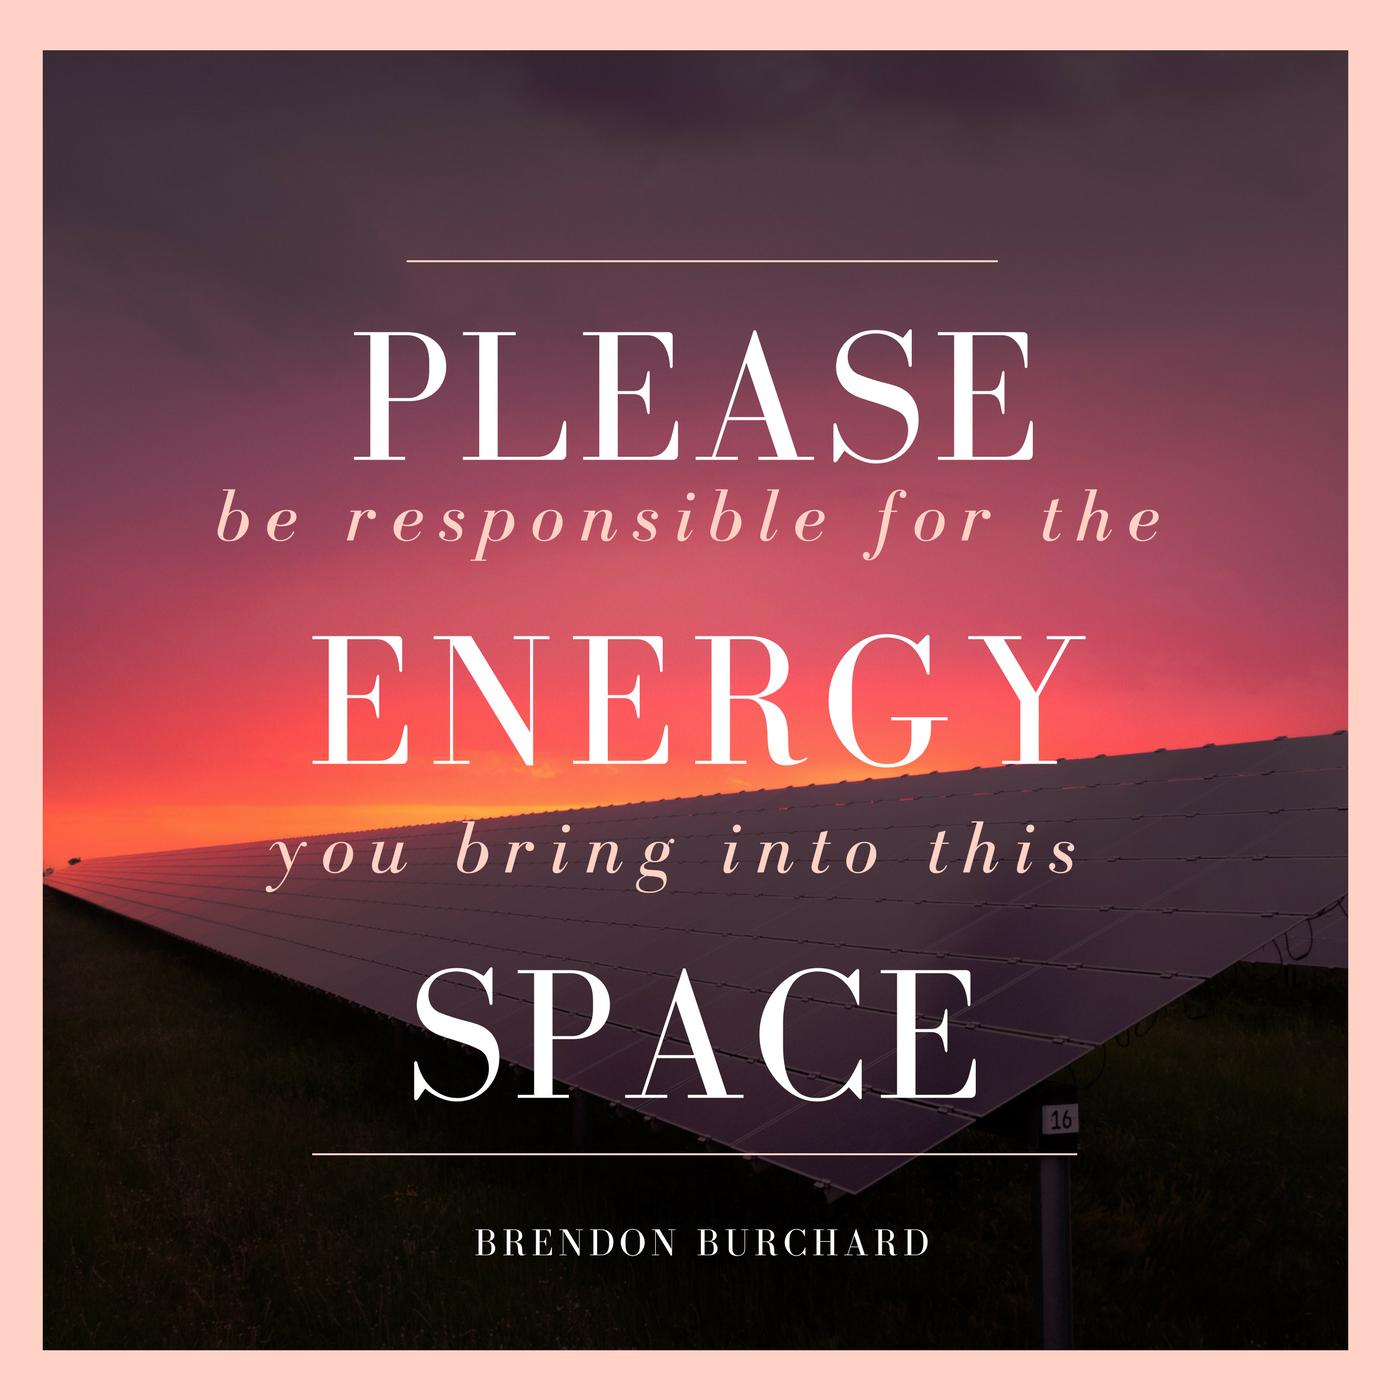 please be responsible Brendon Burchard